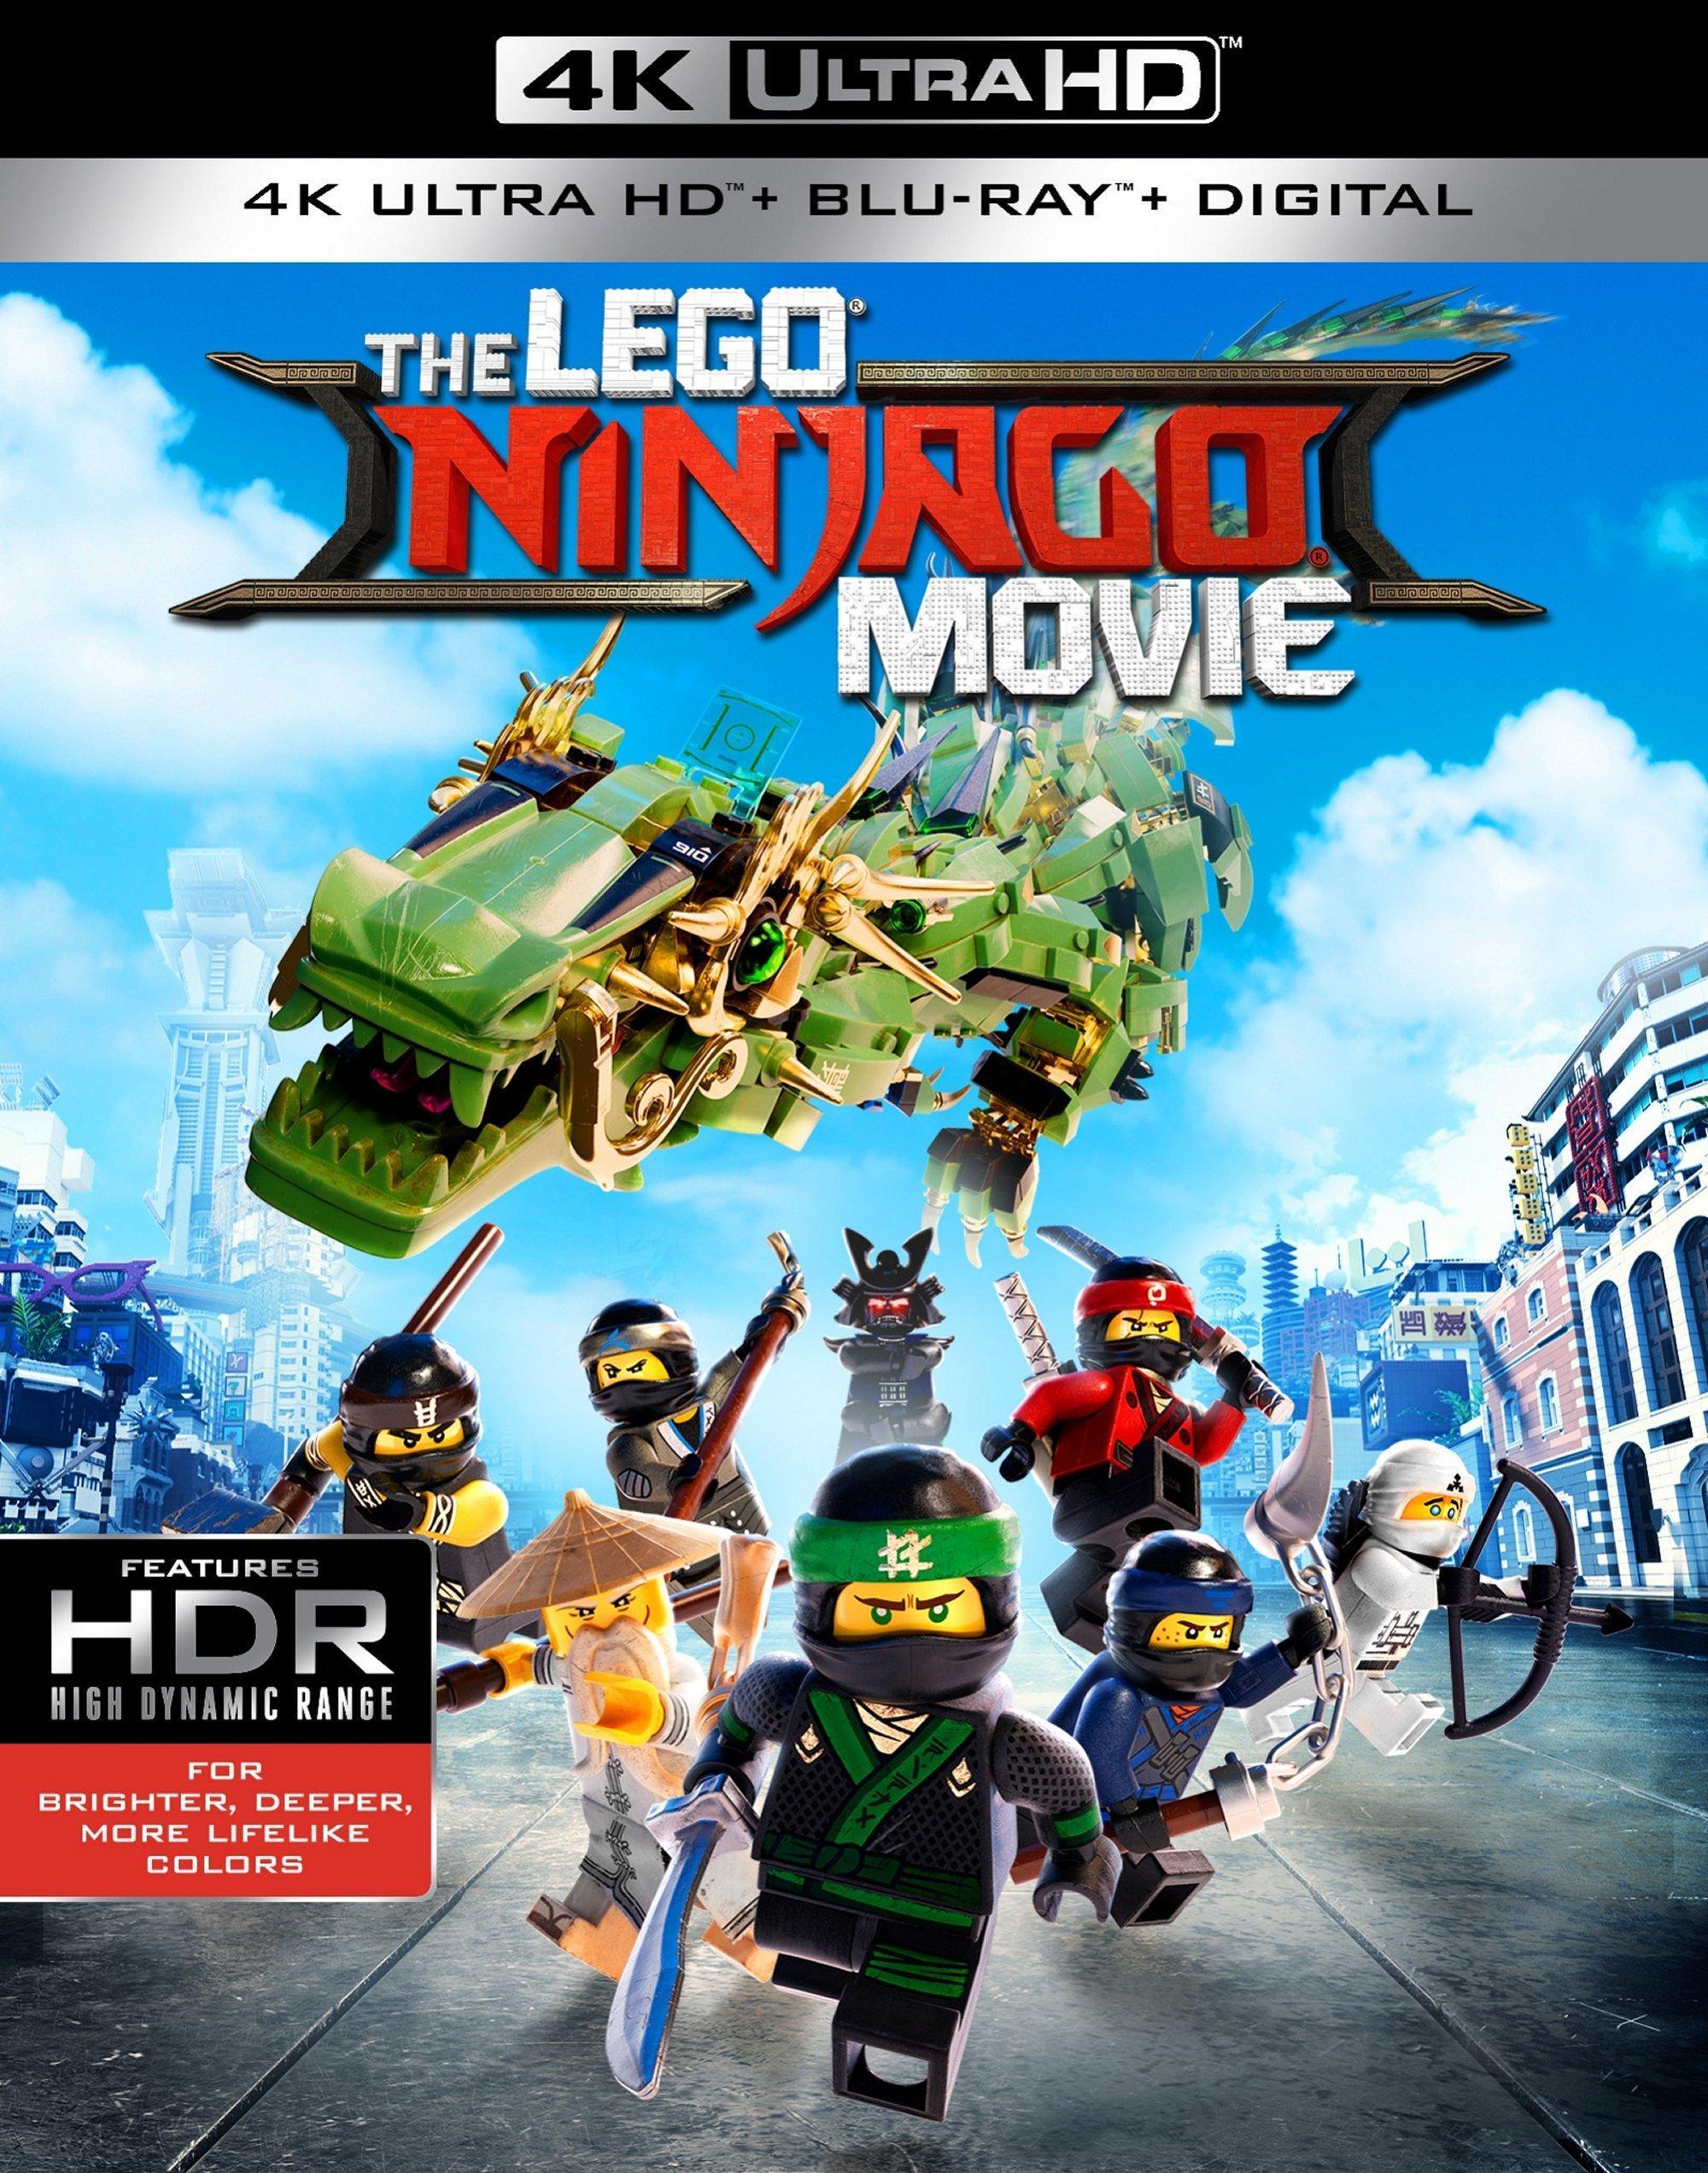 The LEGO Ninjago Movie 4K (2017) UHD Ultra HD Blu-ray